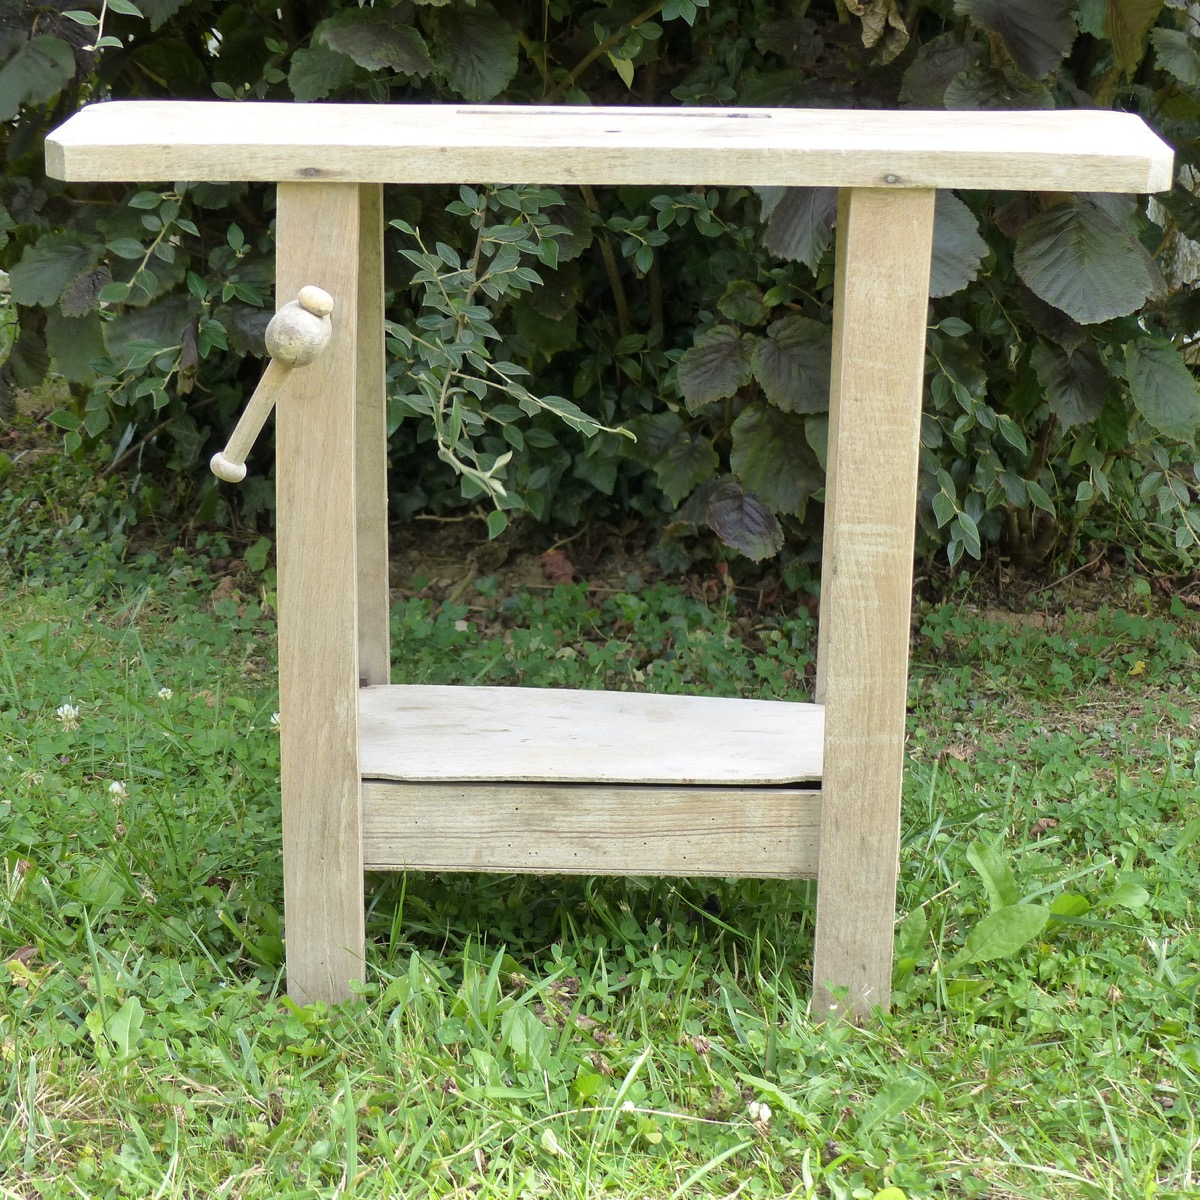 etabli en bois pour enfant lignedebrocante brocante en ligne chine pour vous meubles vintage. Black Bedroom Furniture Sets. Home Design Ideas